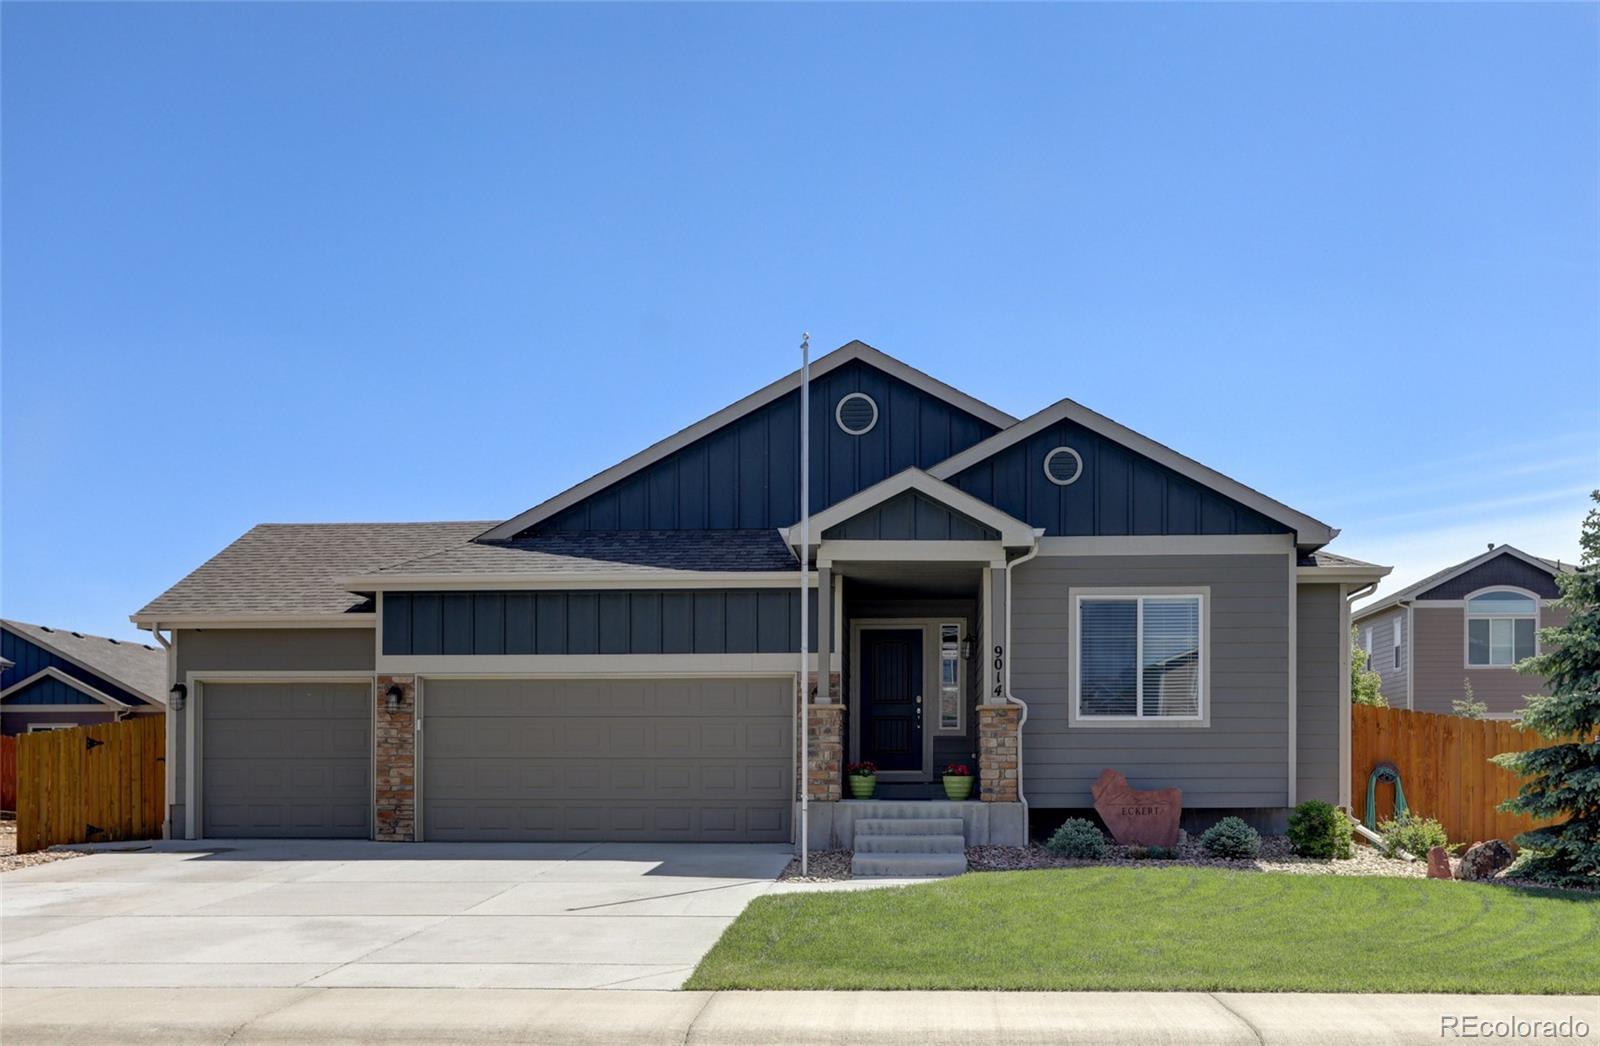 9014 Harlequin Circle, Frederick, CO 80504 - Frederick, CO real estate listing